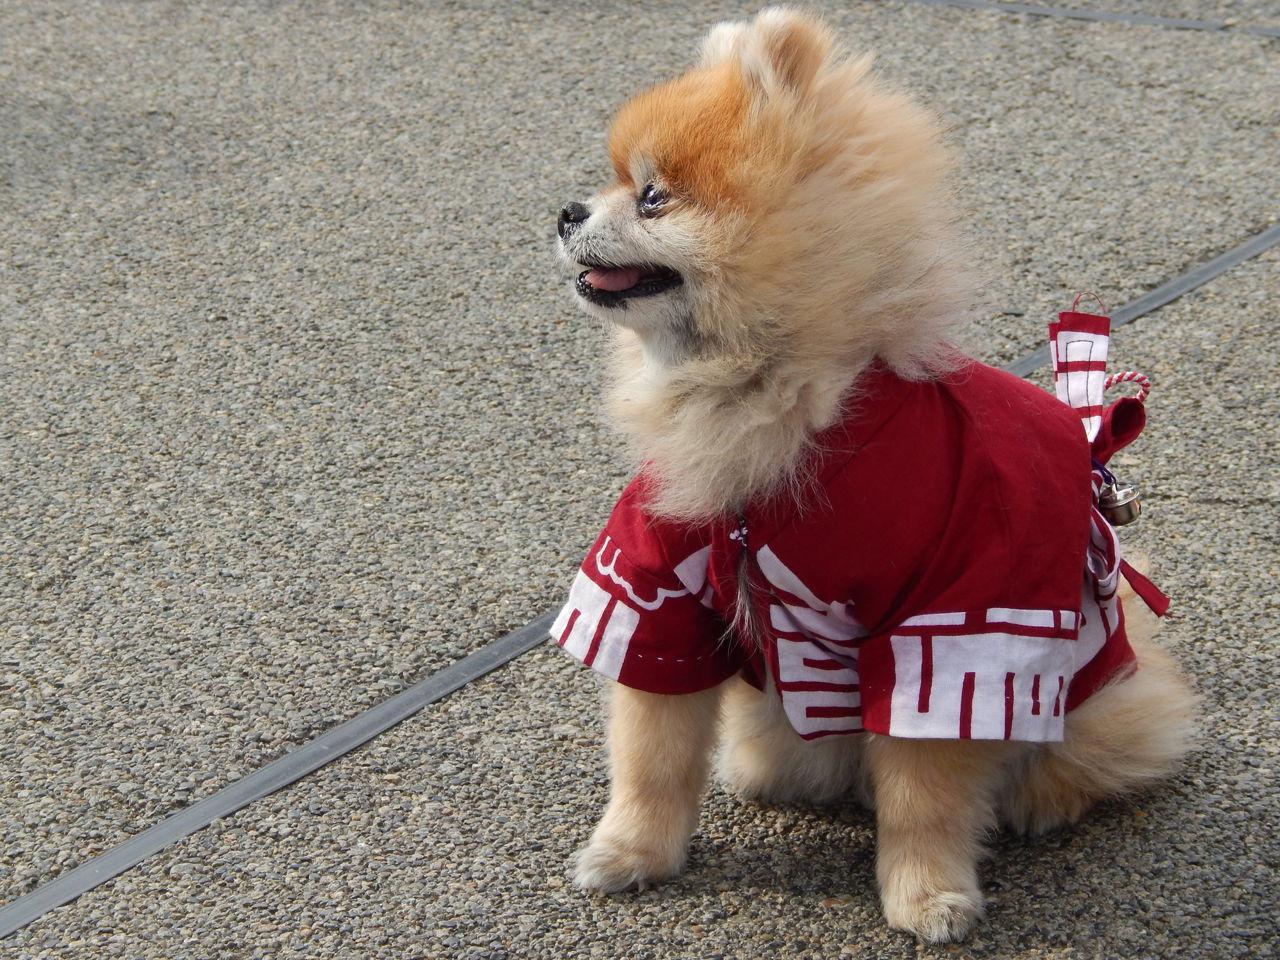 Hawaiian Pet Names For Dogs